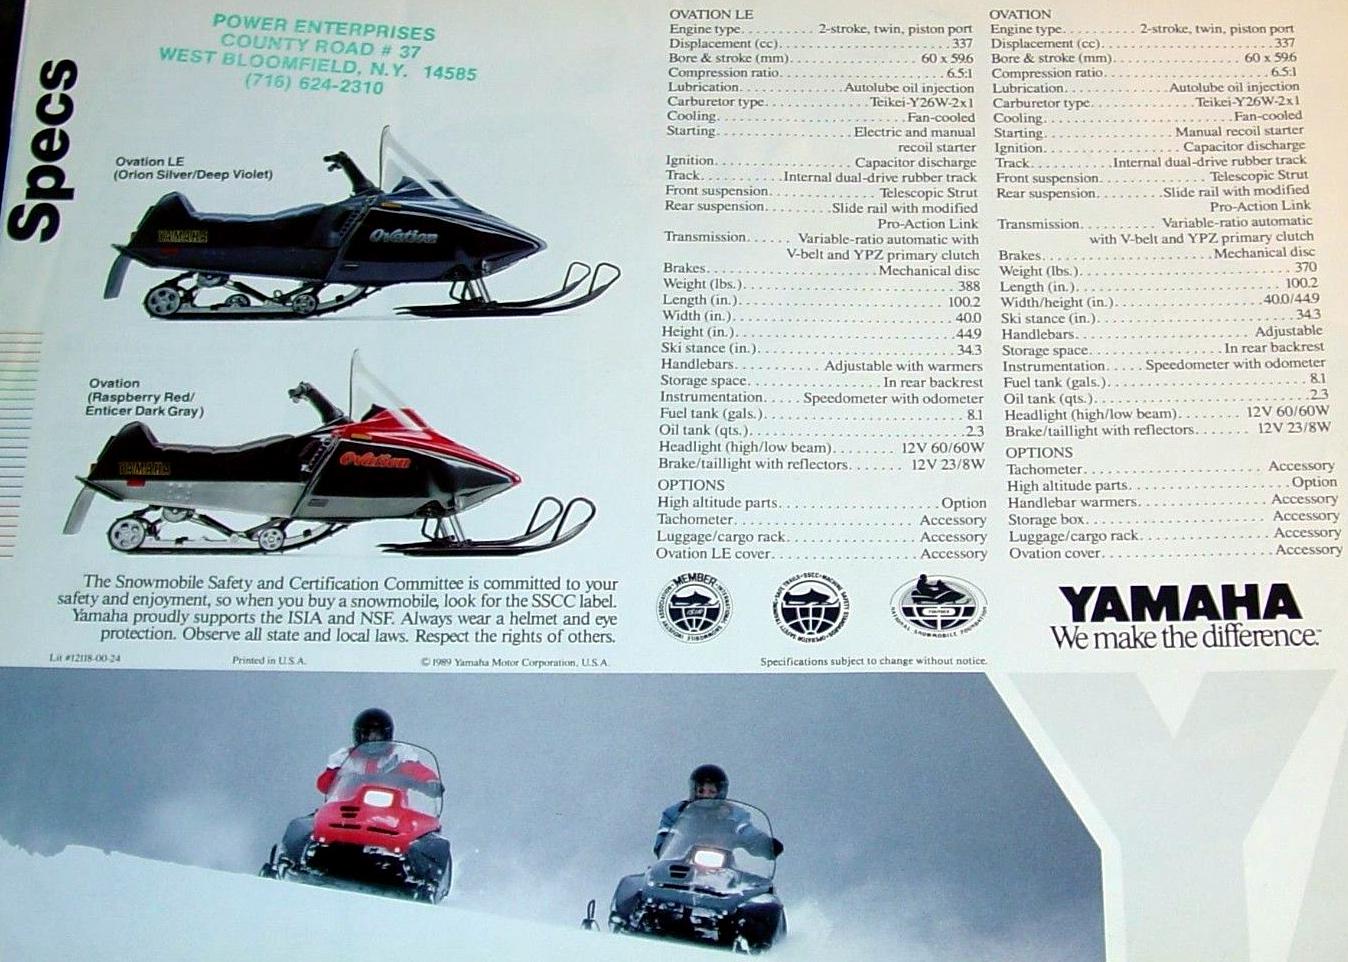 Sno Xx as well D Yamaha Ovation together with Yamaha Ovation July Pp C as well Yamaha Srv V Gwadmrmyyjg besides O. on yamaha ovation snowmobile